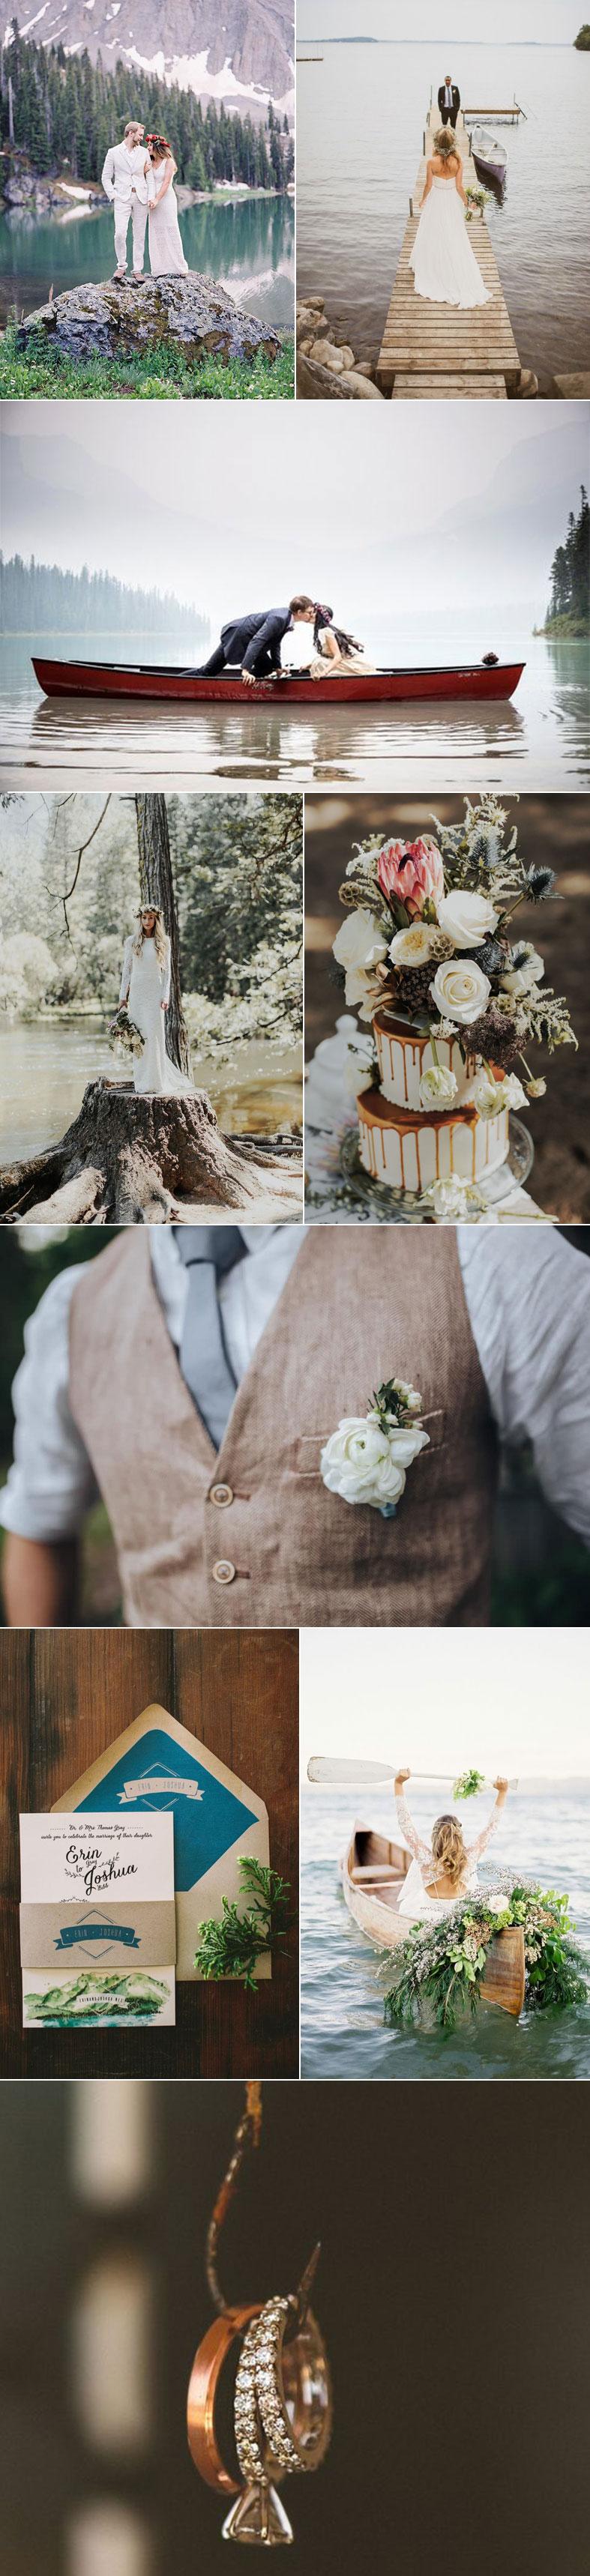 How To Plan A Lake Wedding